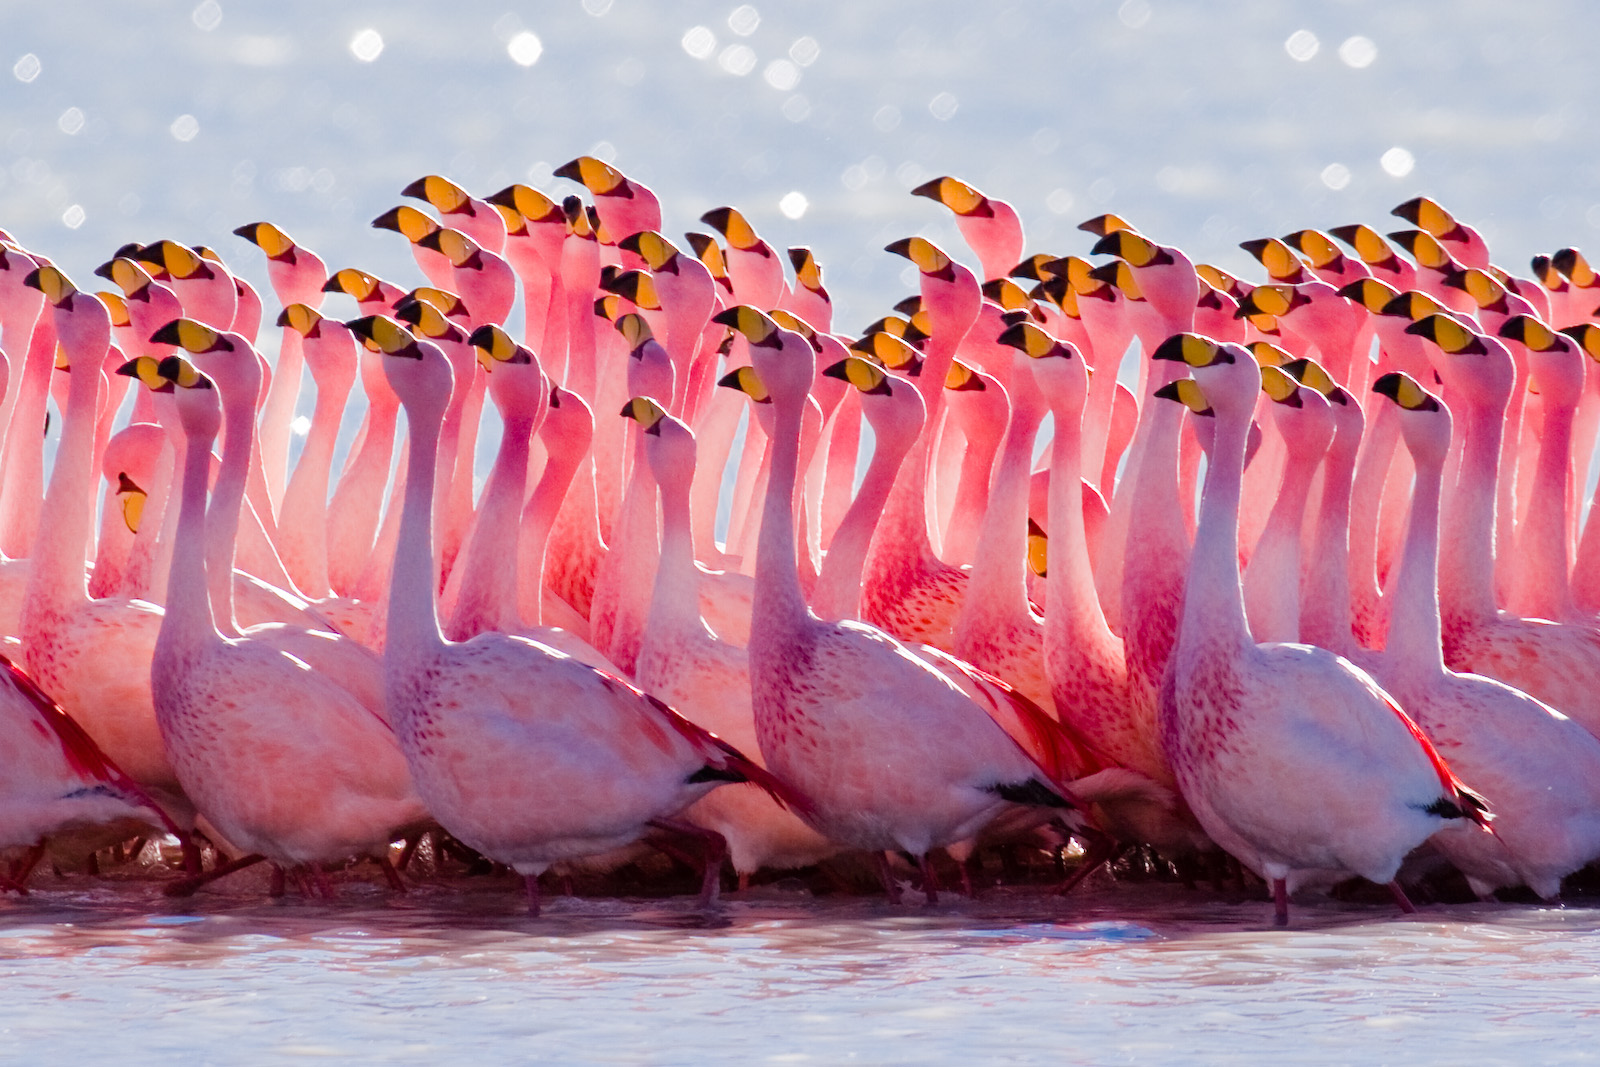 http://upload.wikimedia.org/wikipedia/commons/f/f6/James%27s_Flamingo_mating_ritual.jpg